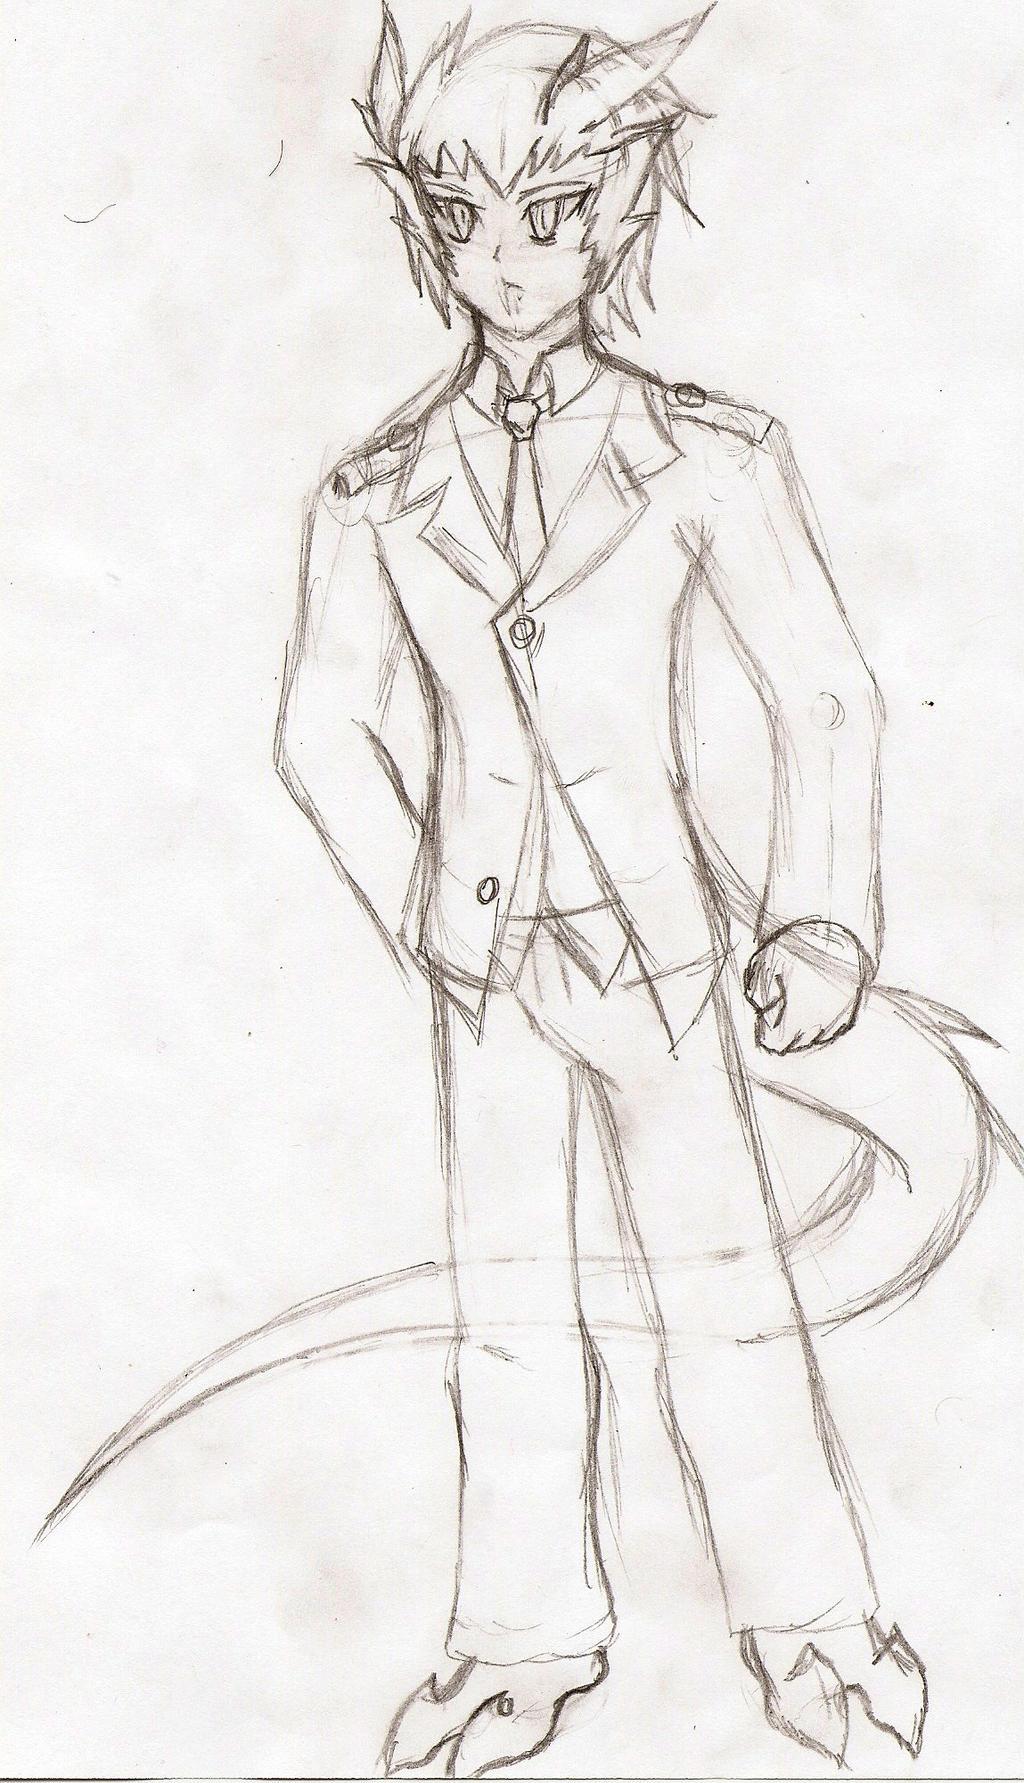 Hero Academia Oc: Tatsuya Ryuu (sketch) by NeonNeoz